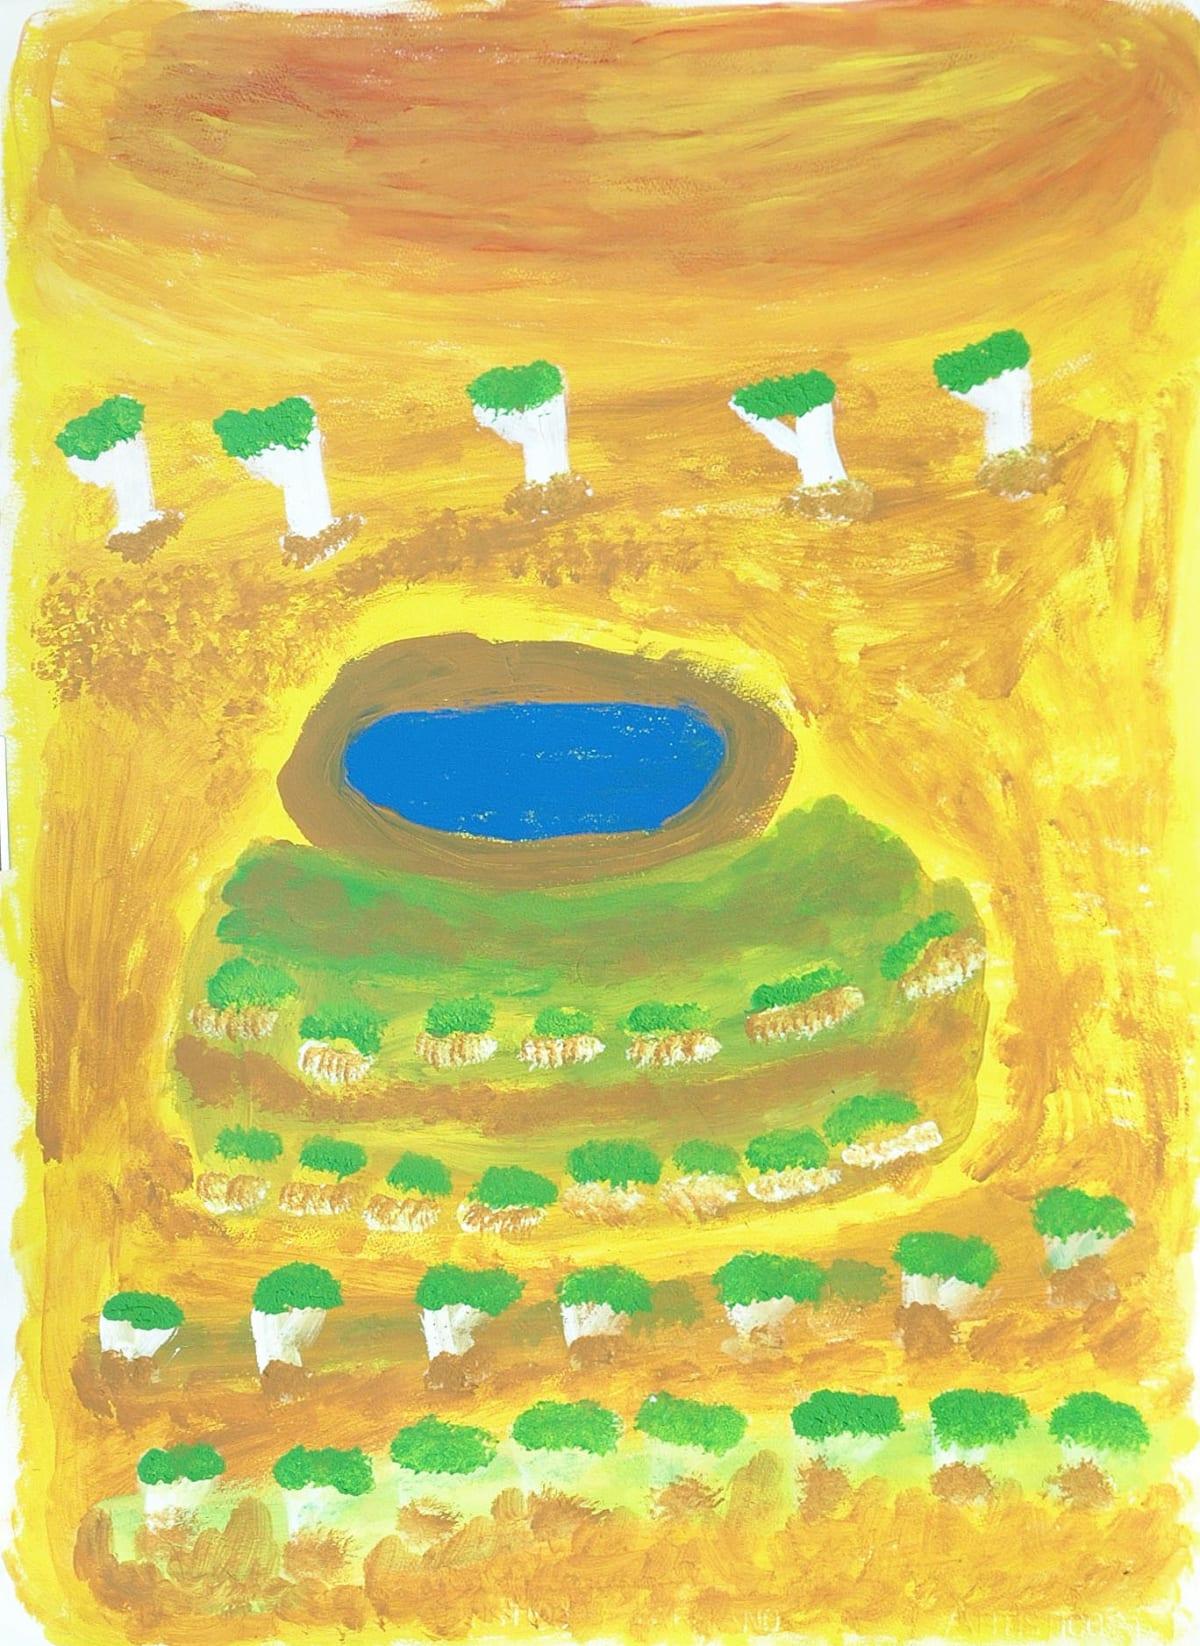 Rosie (Tarku) Tarco King Japirnka atelier artist acrylic on 250gsm velin arches 56 x 76 cm